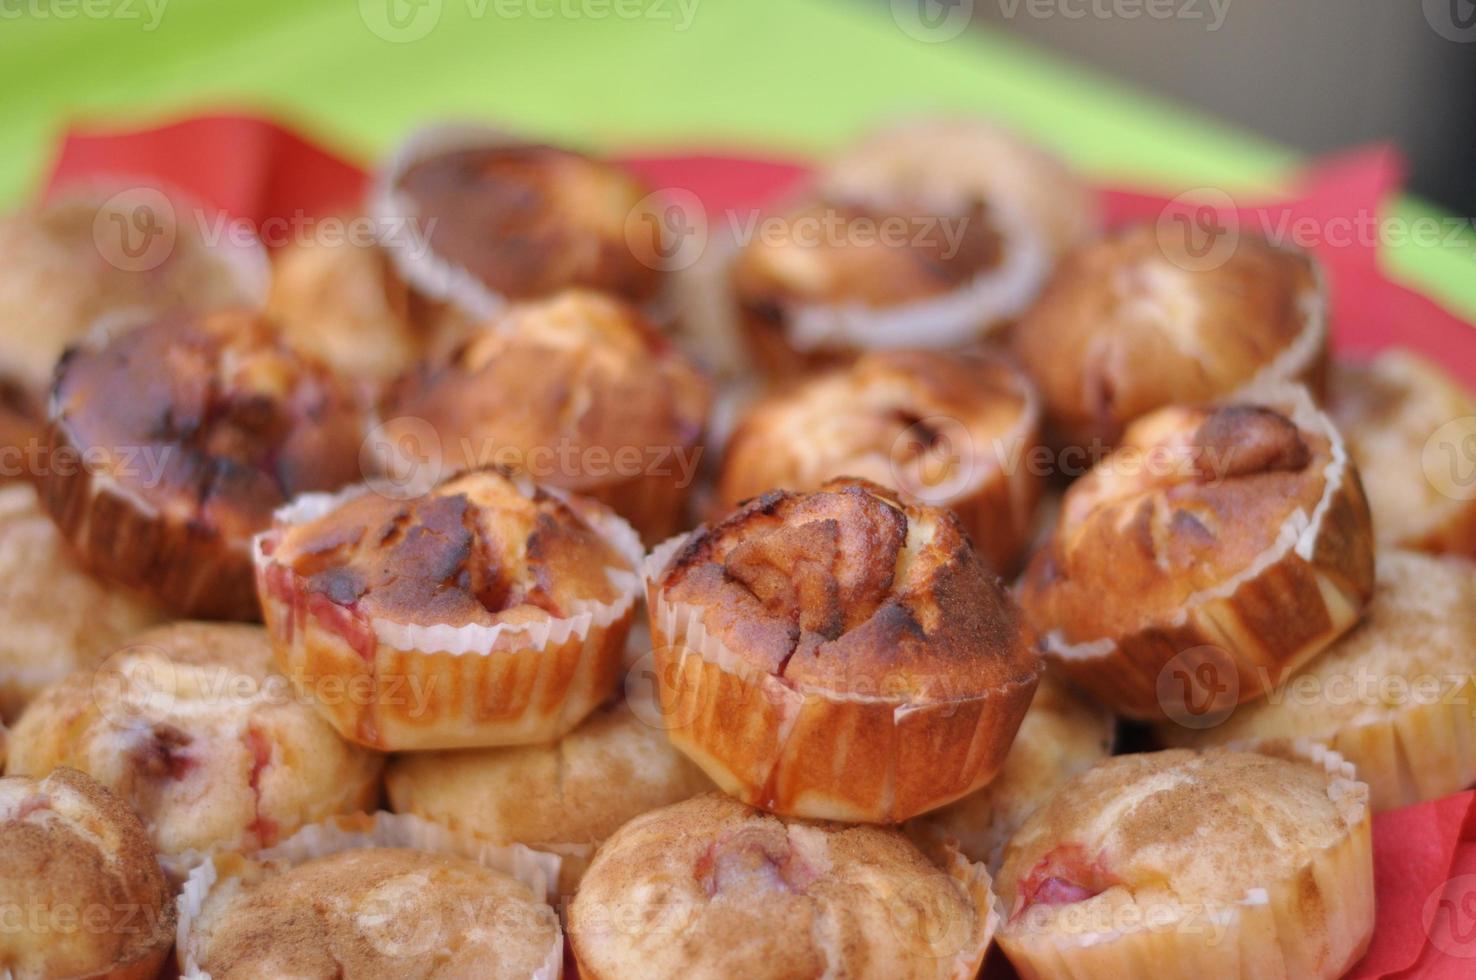 muffins à la confiture photo